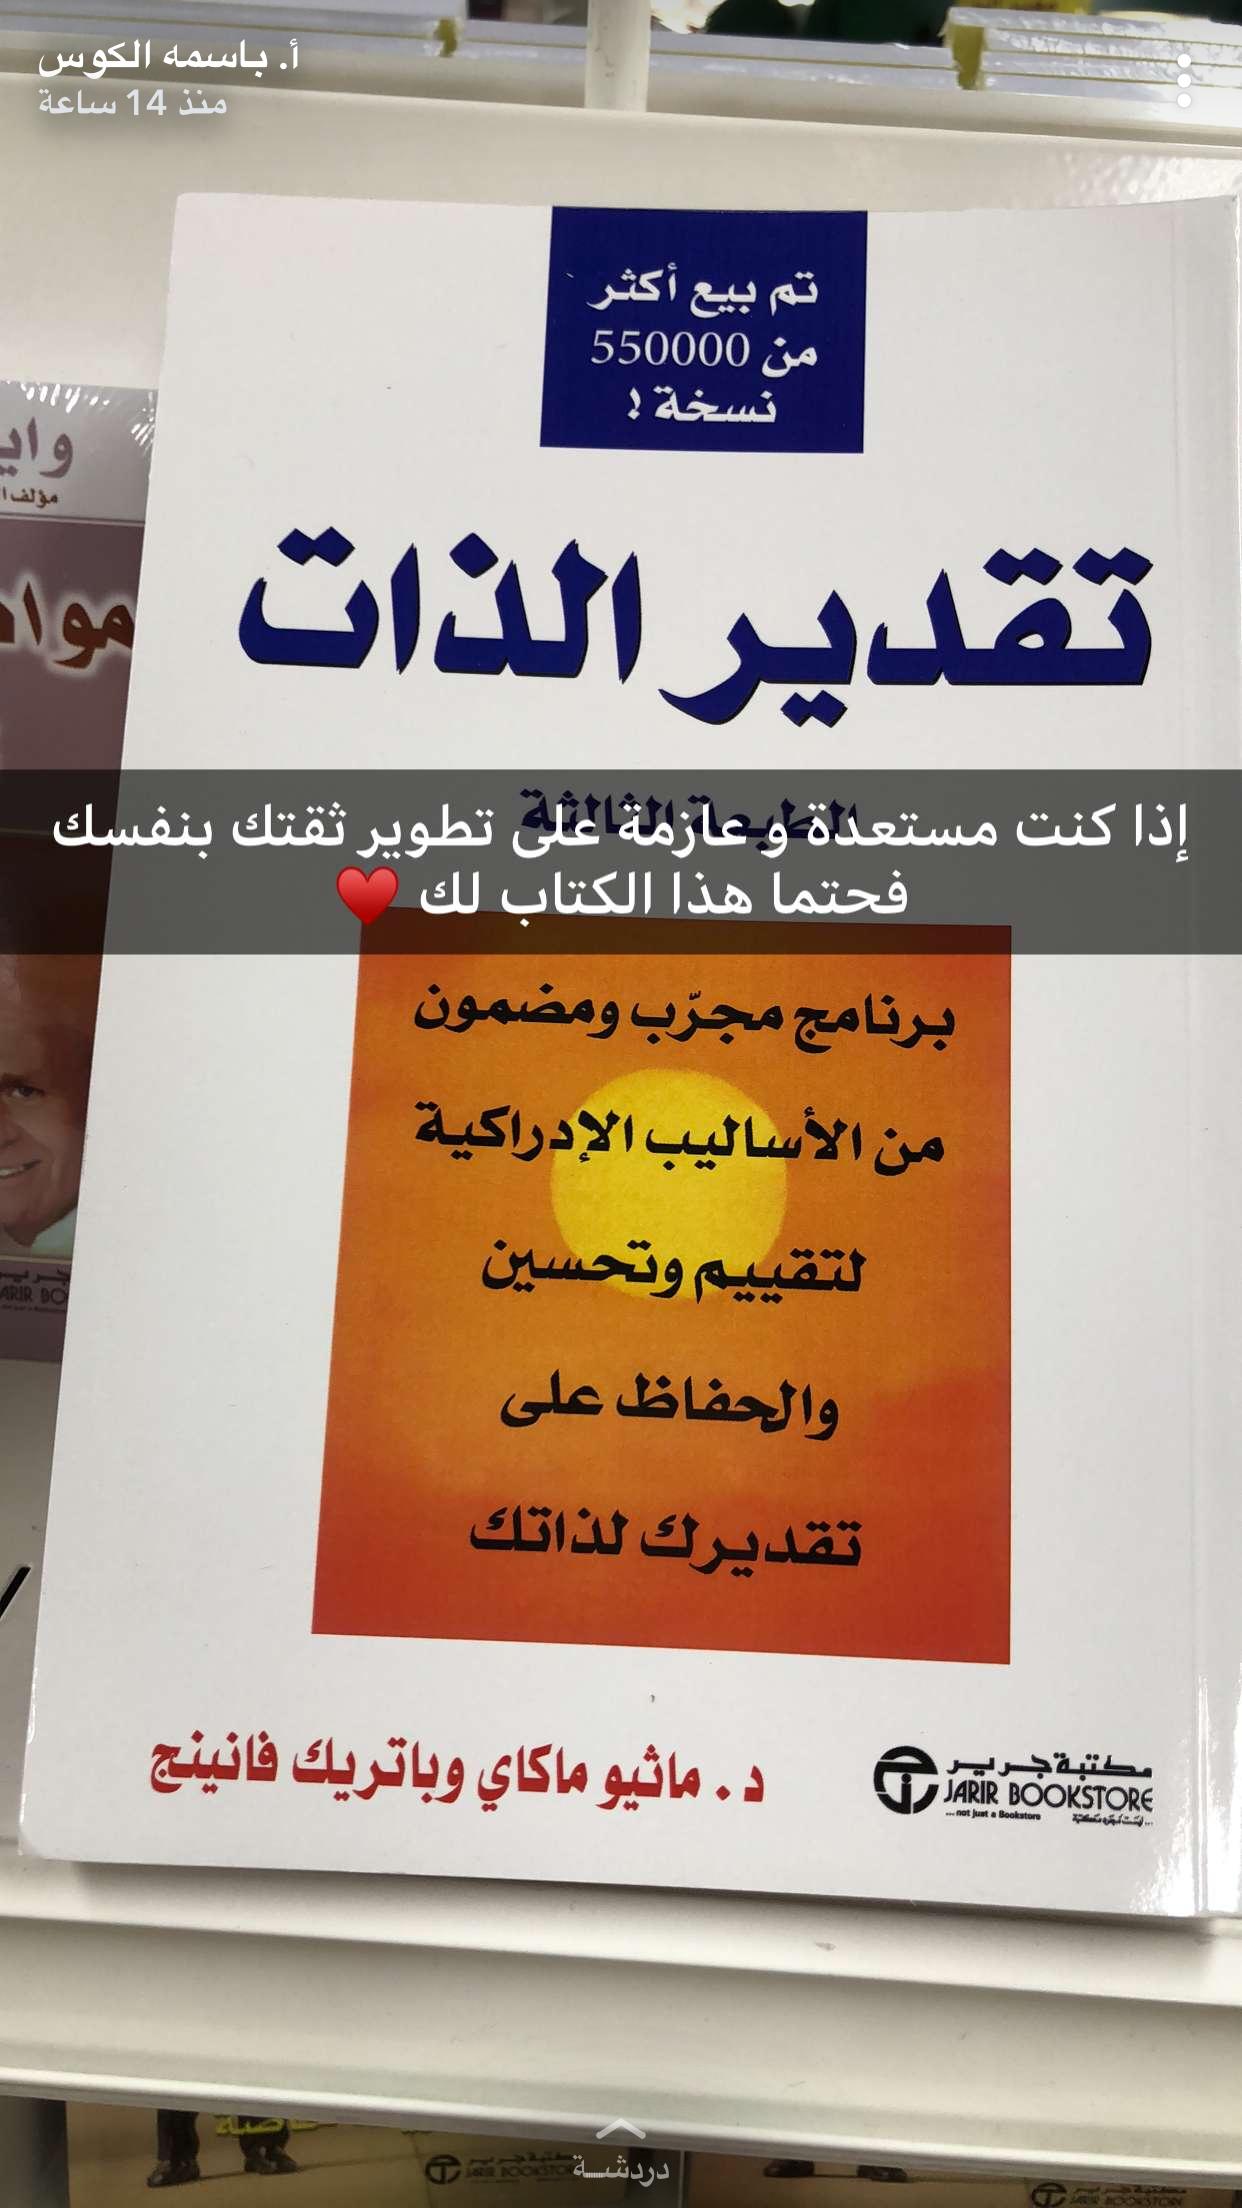 اسم الإصدار السرنديب المؤلف د صلاح الراشد Free Books Download Books To Read Book Lovers